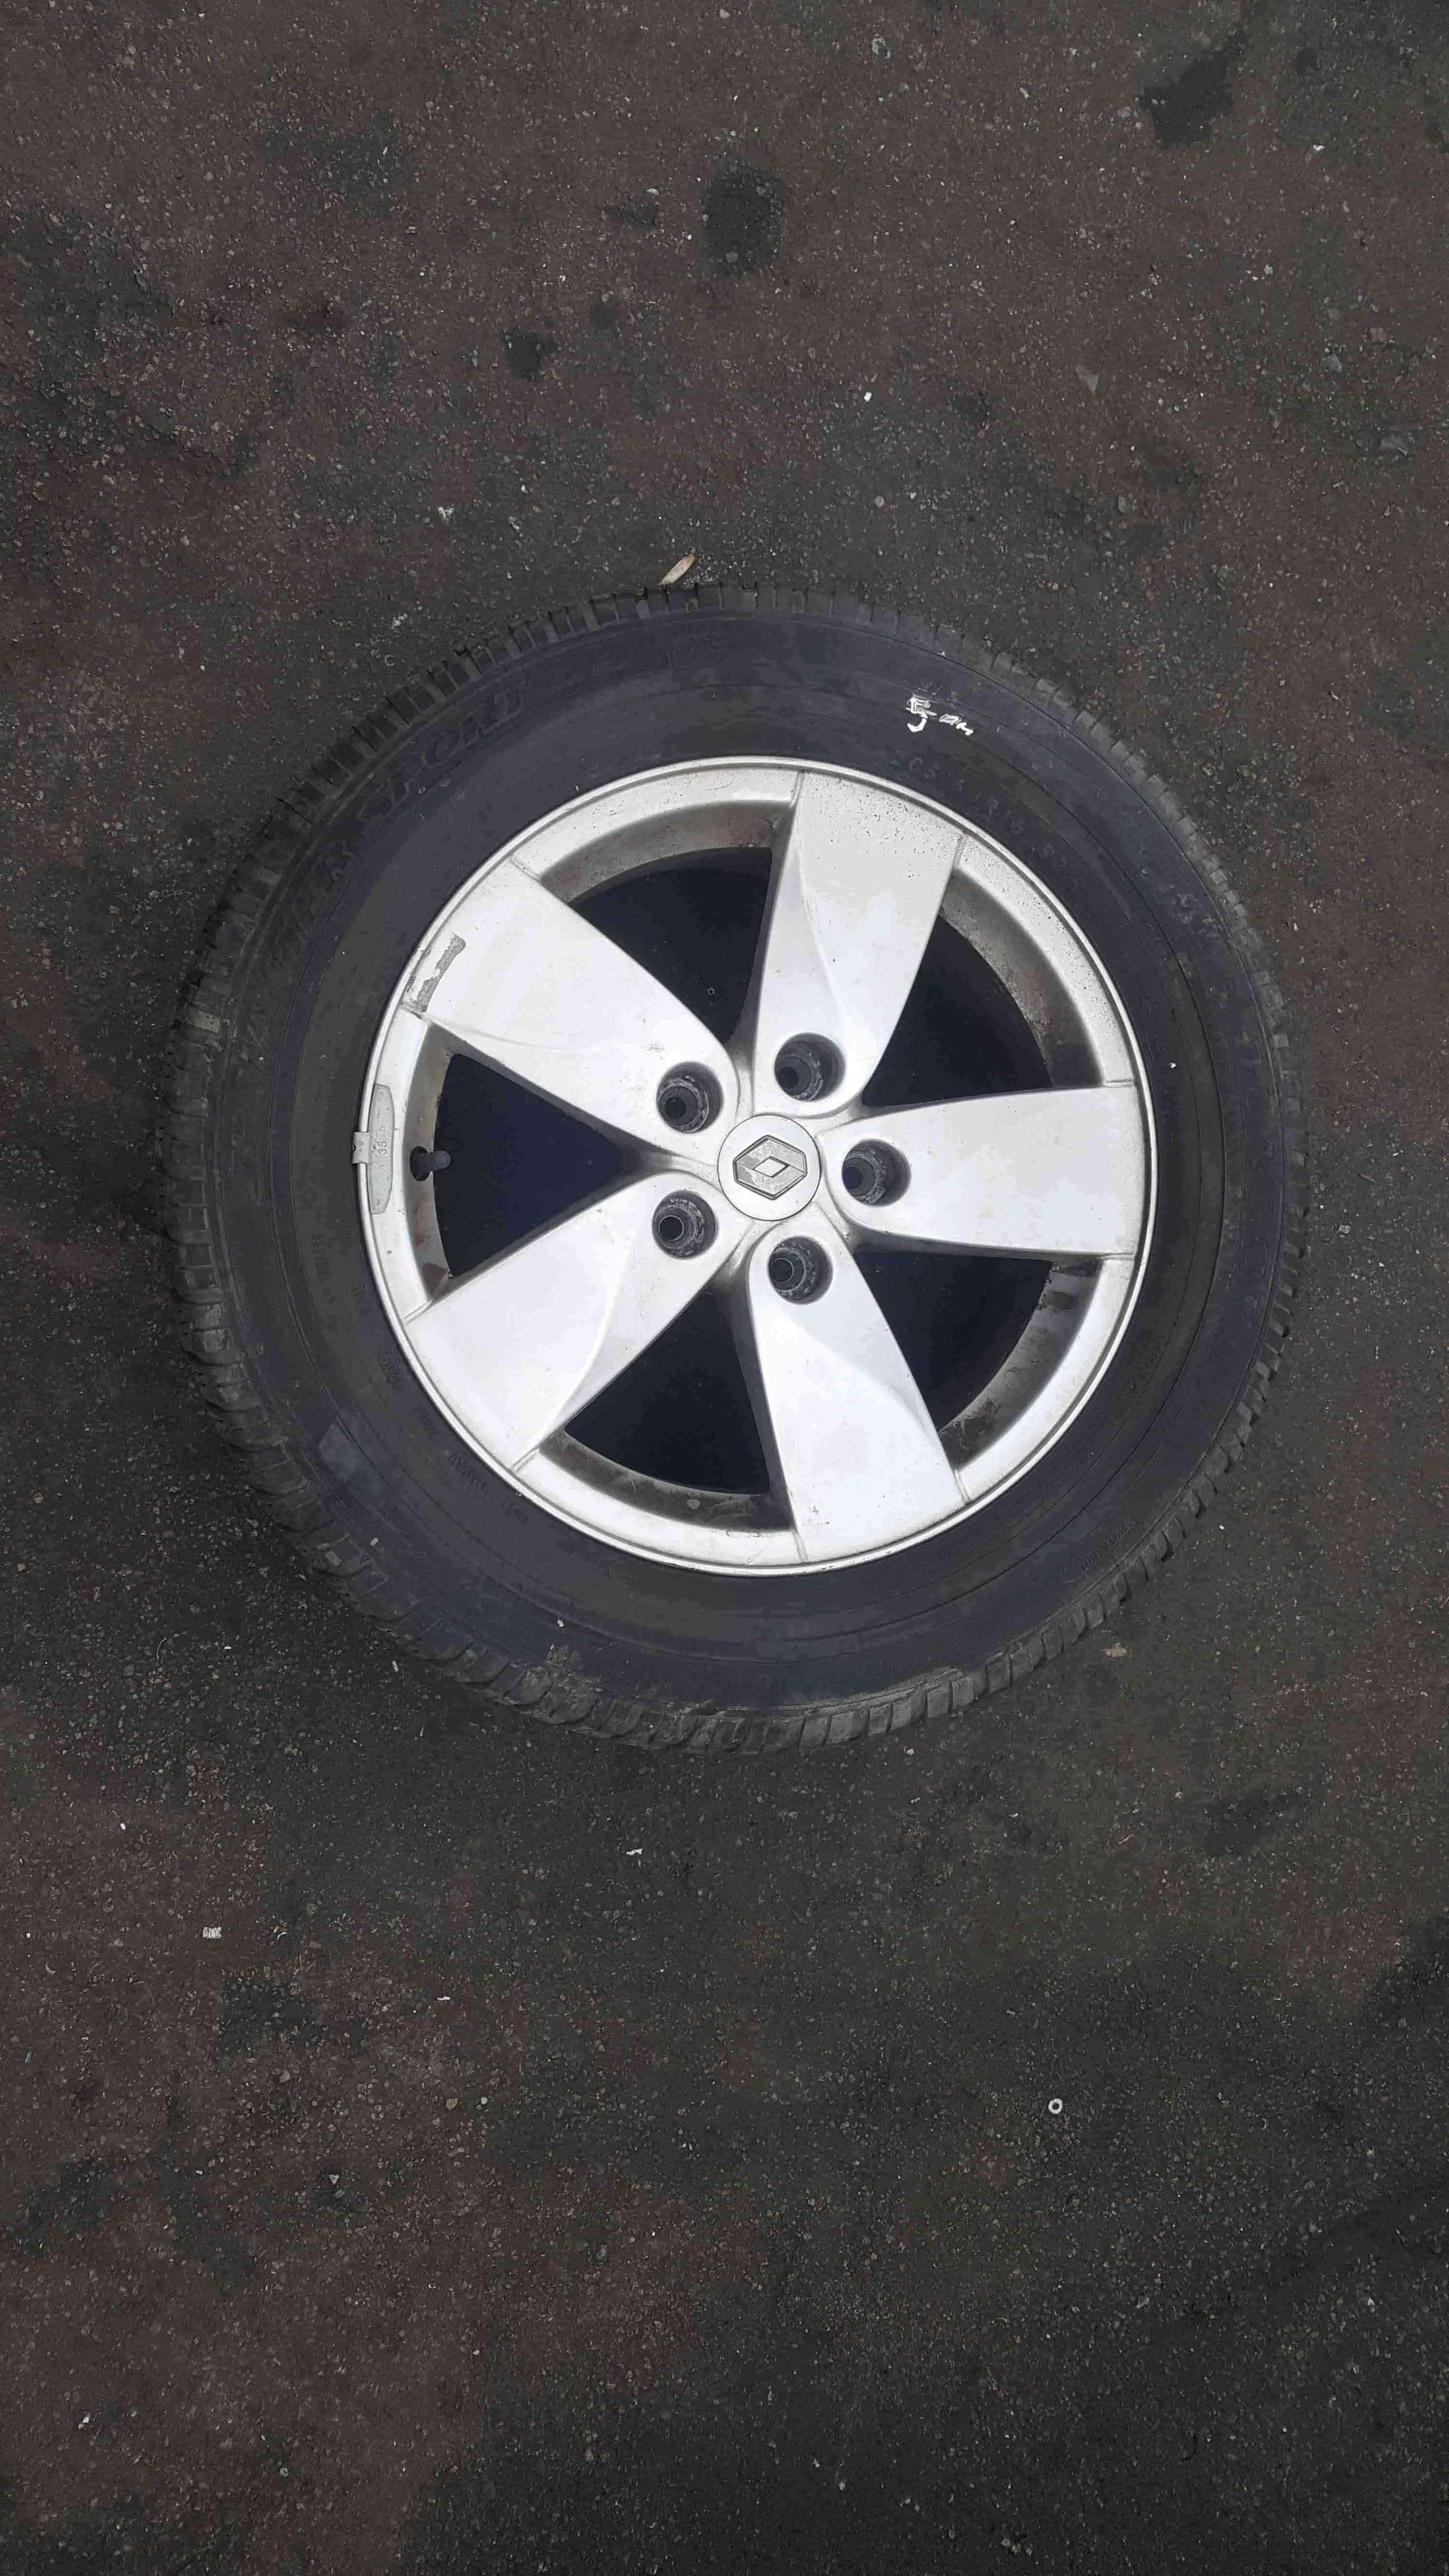 Renault Megane MK3 2008-2014 Proteus Alloy Wheel 16inch 16 205 50 16 5mm